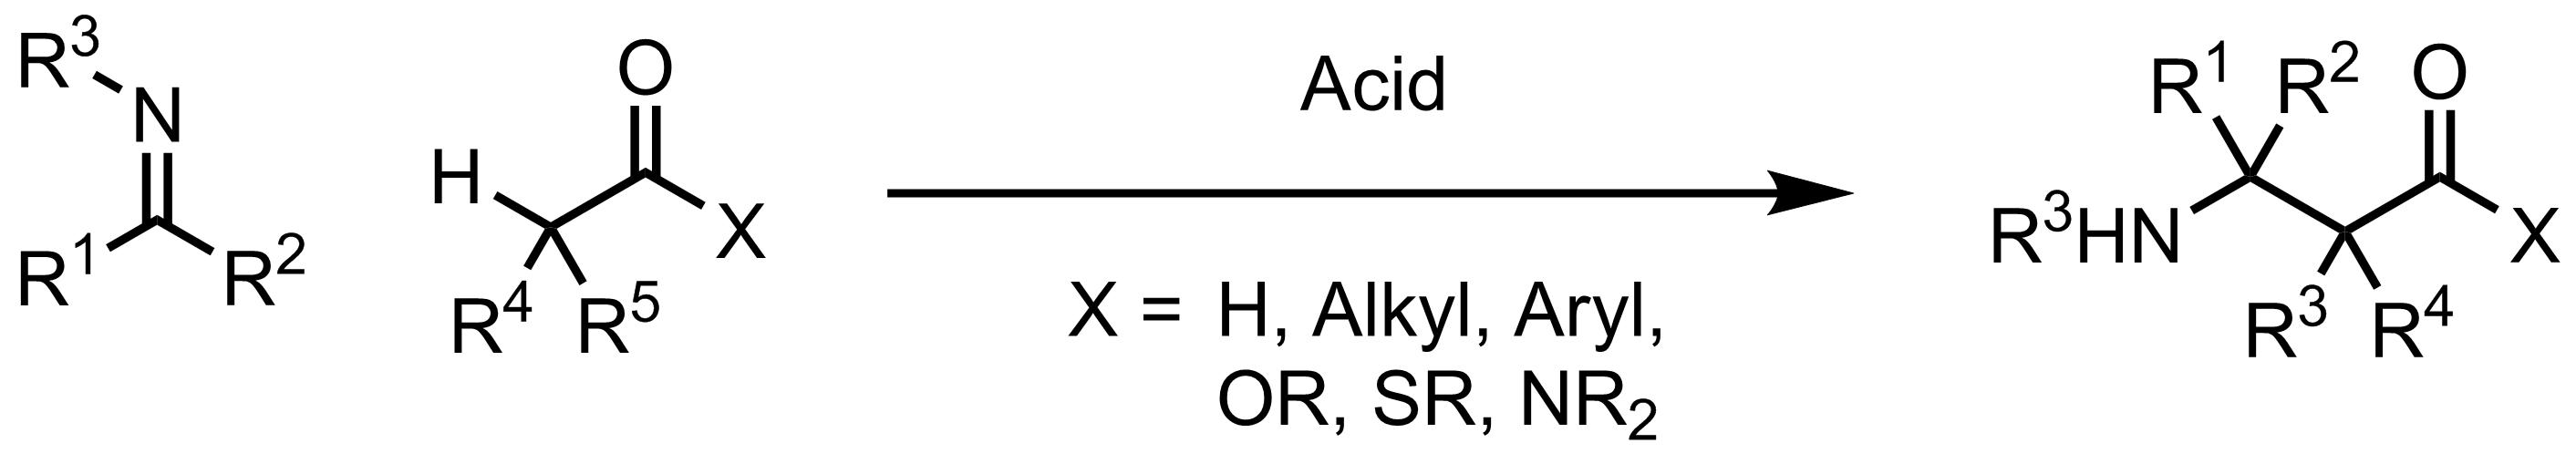 Schematic representation of the Mannich Reaction.